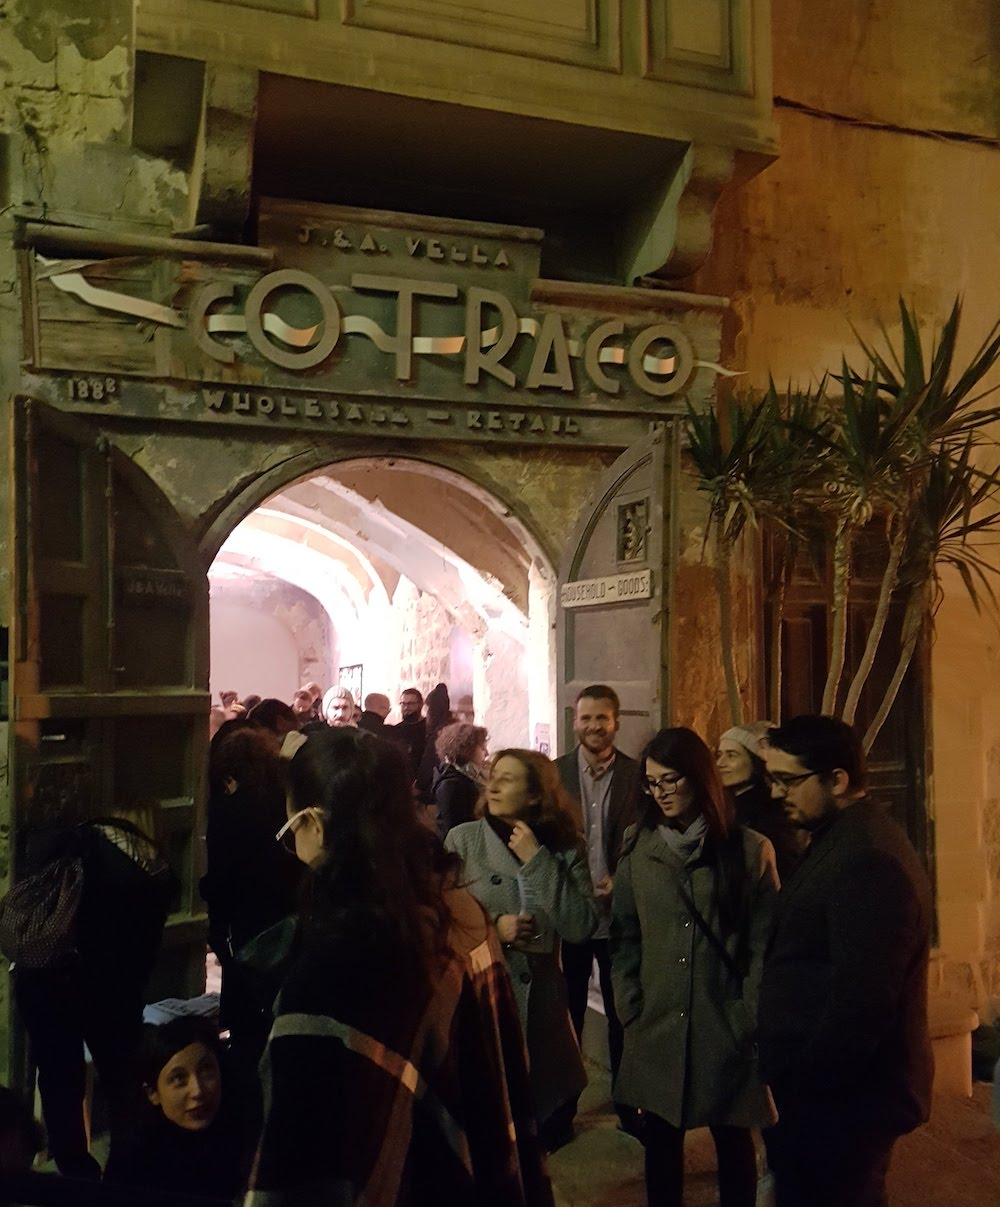 SnakeShow_Fragmenta-Malta_PicBettinaHutschek_04